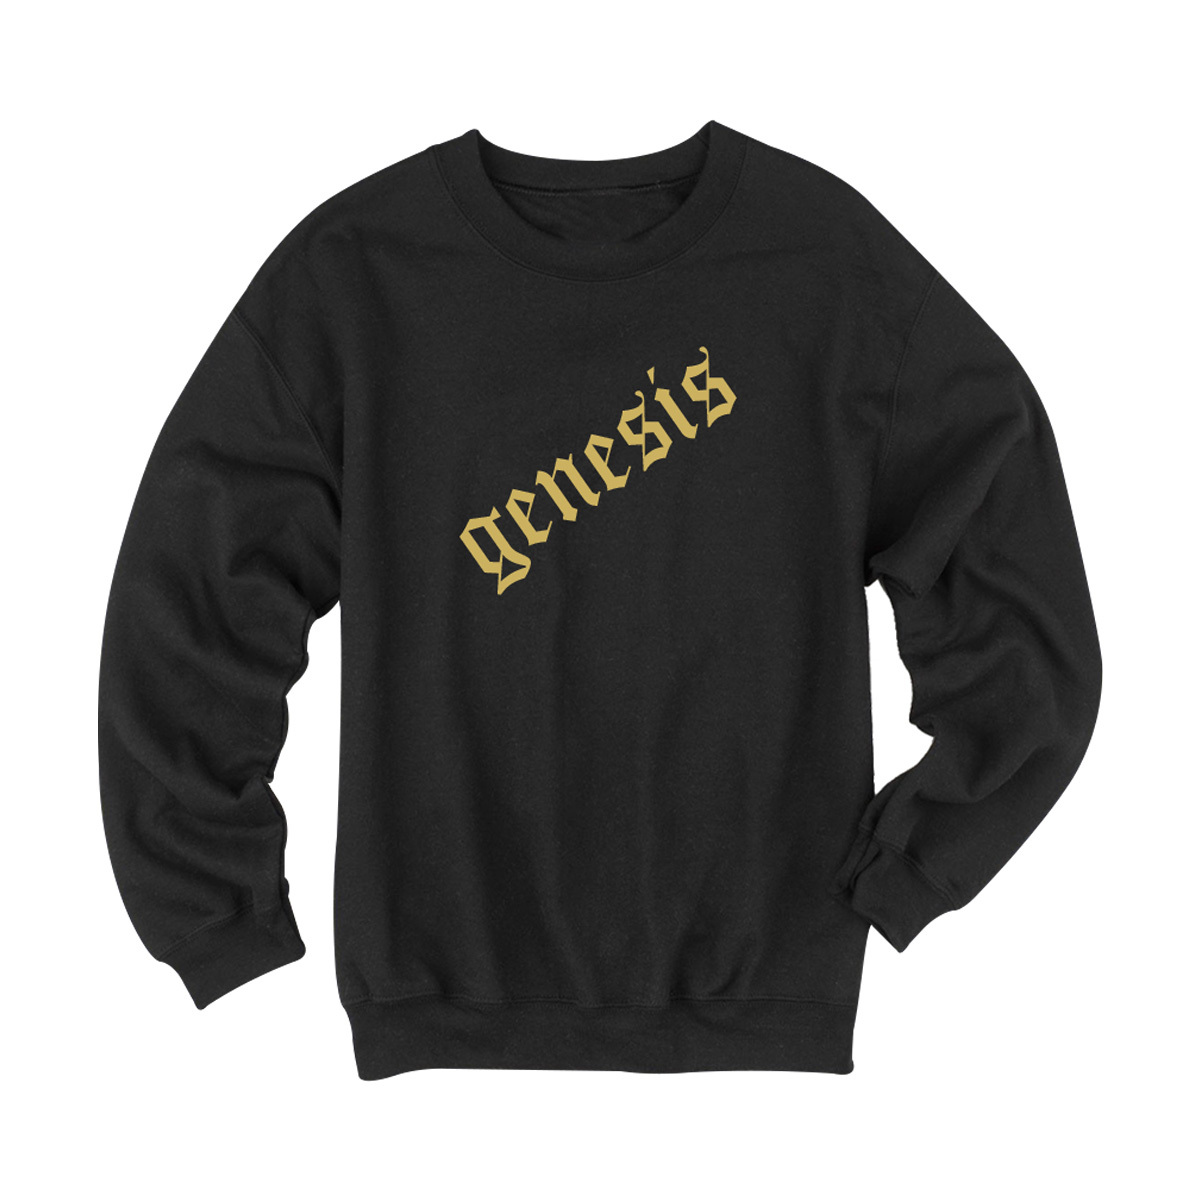 From Genesis to Revelation Crew Neck Sweatshirt